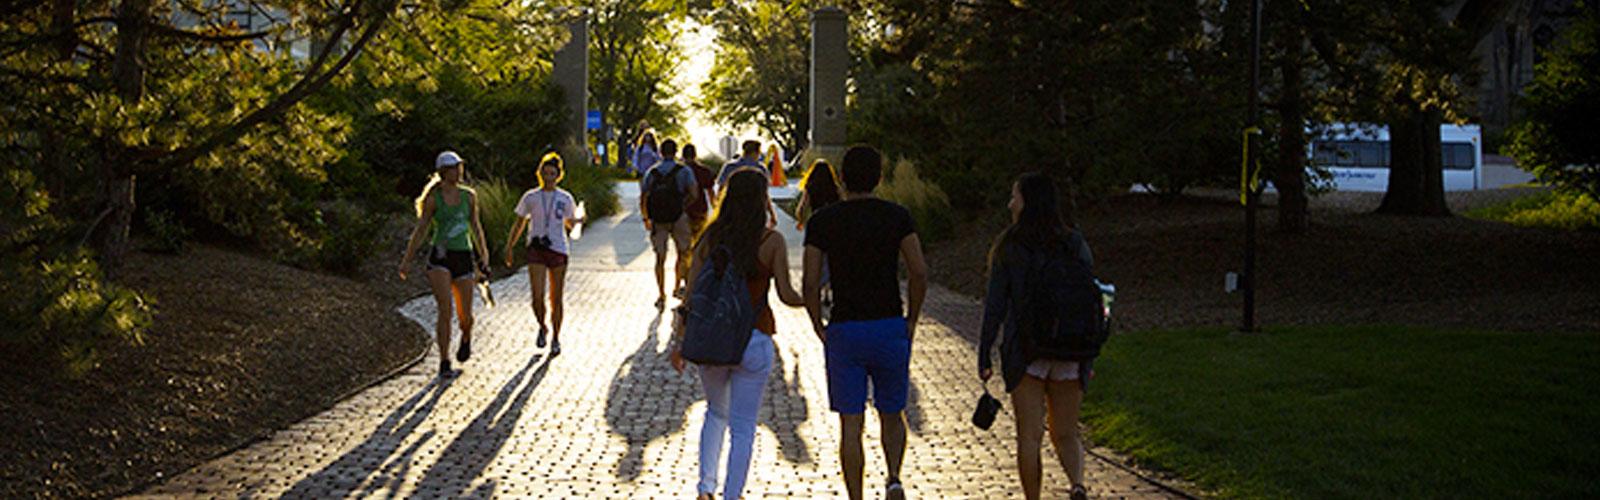 students walking at creighton university